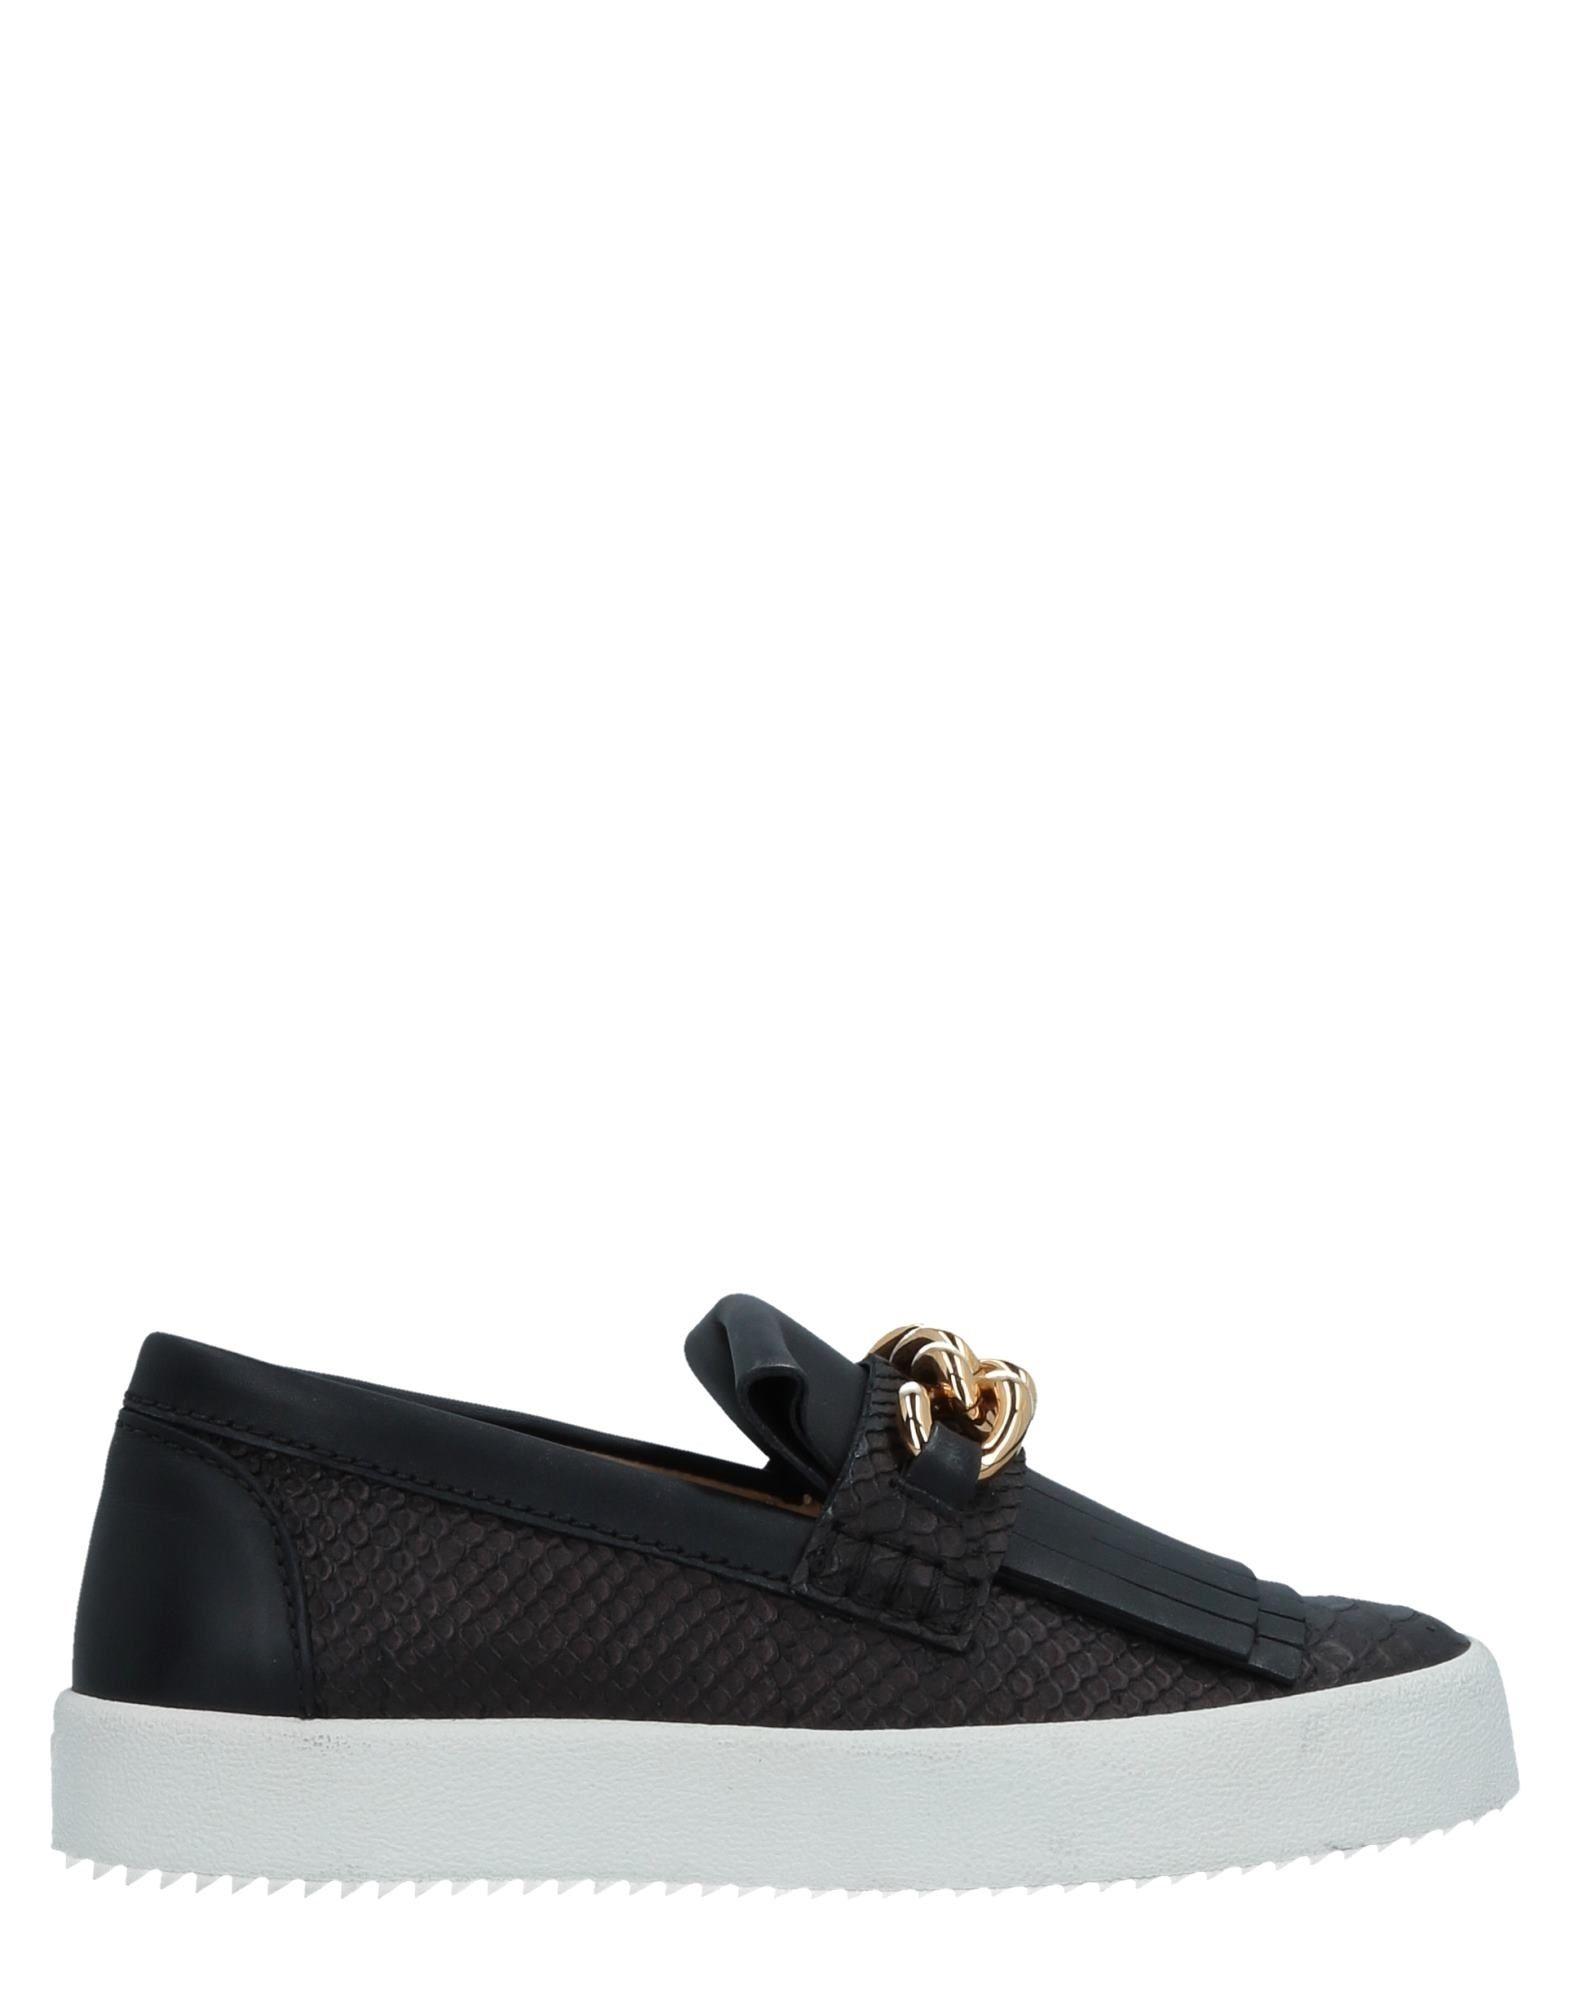 Rabatt Schuhe Giuseppe Zanotti Sneakers Damen  11514804PO